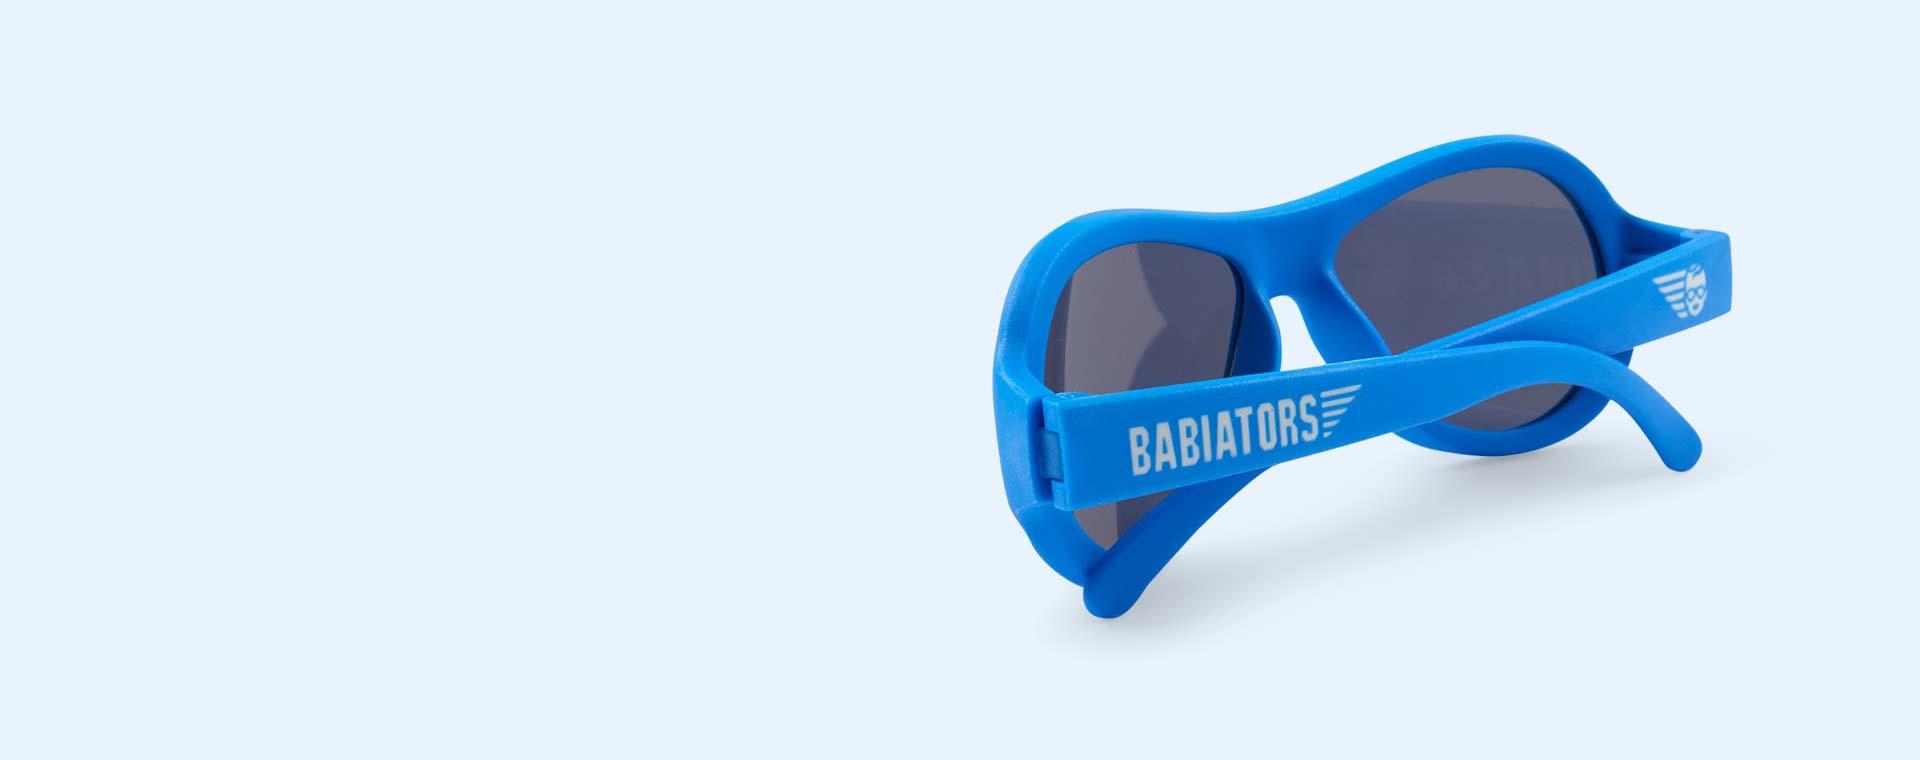 True Blue Babiators Original Aviators